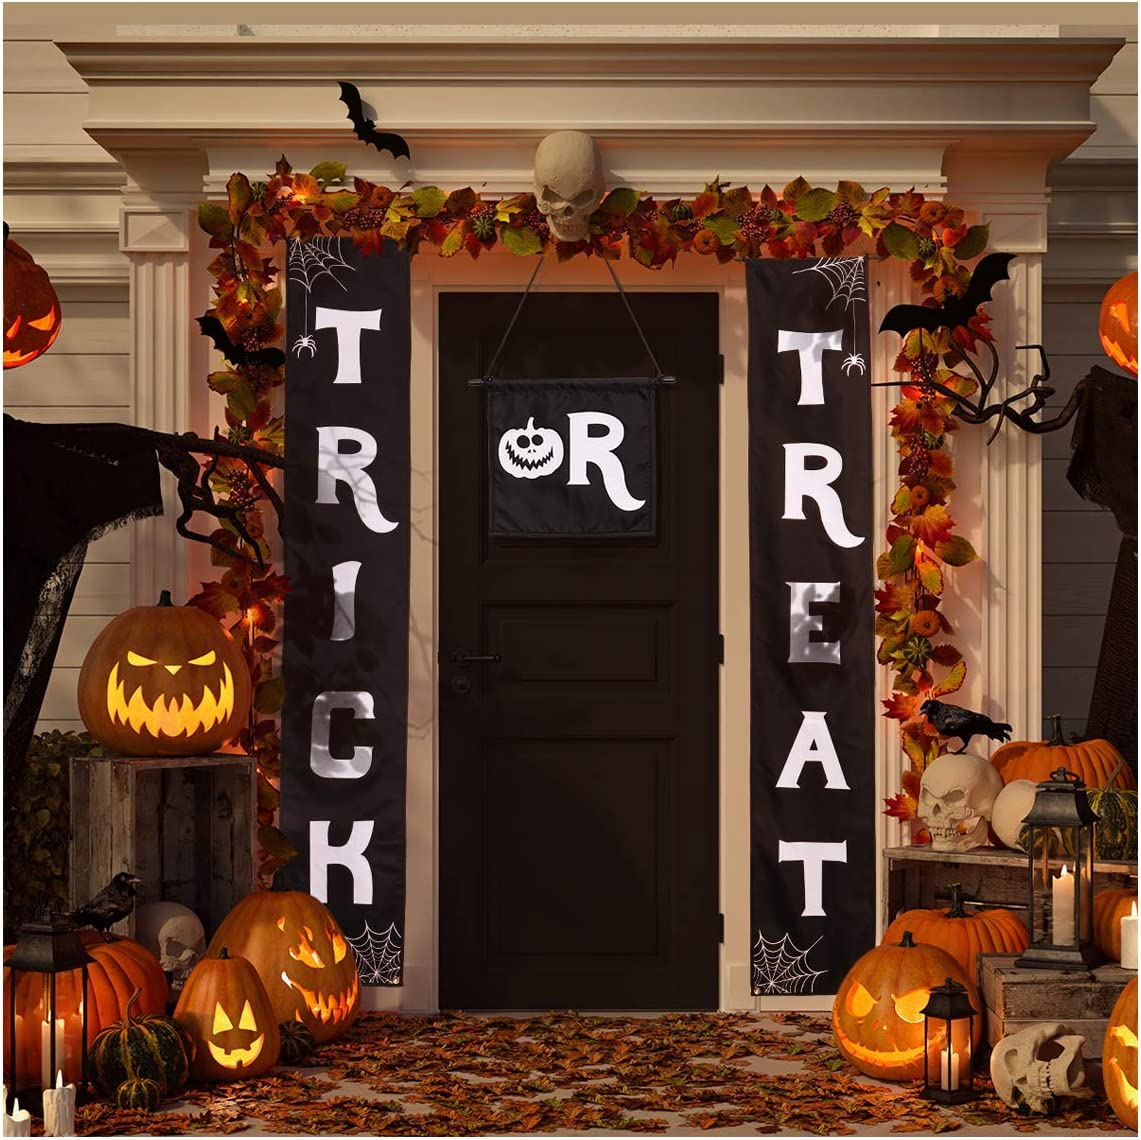 Halloween Banner Halloween Decorations Halloween Signs for Front Door or Indoor Home Decor Porch Decorations, 3 pcs